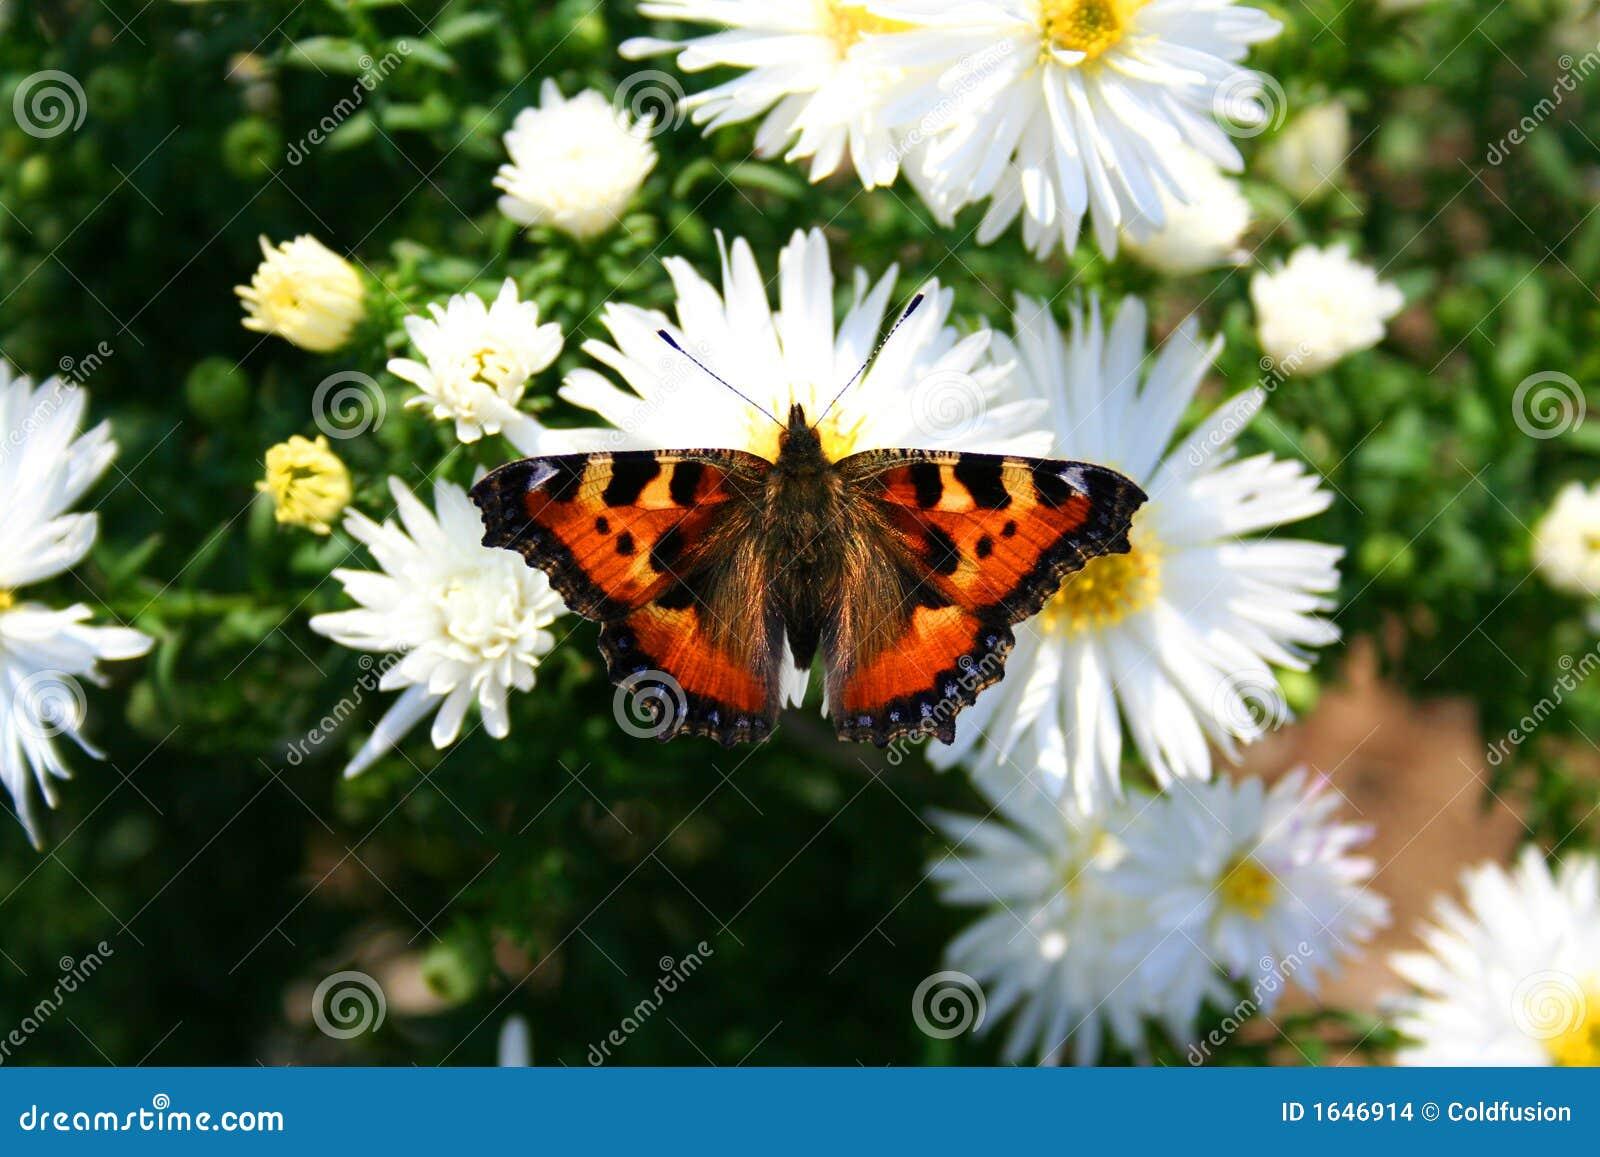 Vlinder op chrysanthemom - aardbeelden